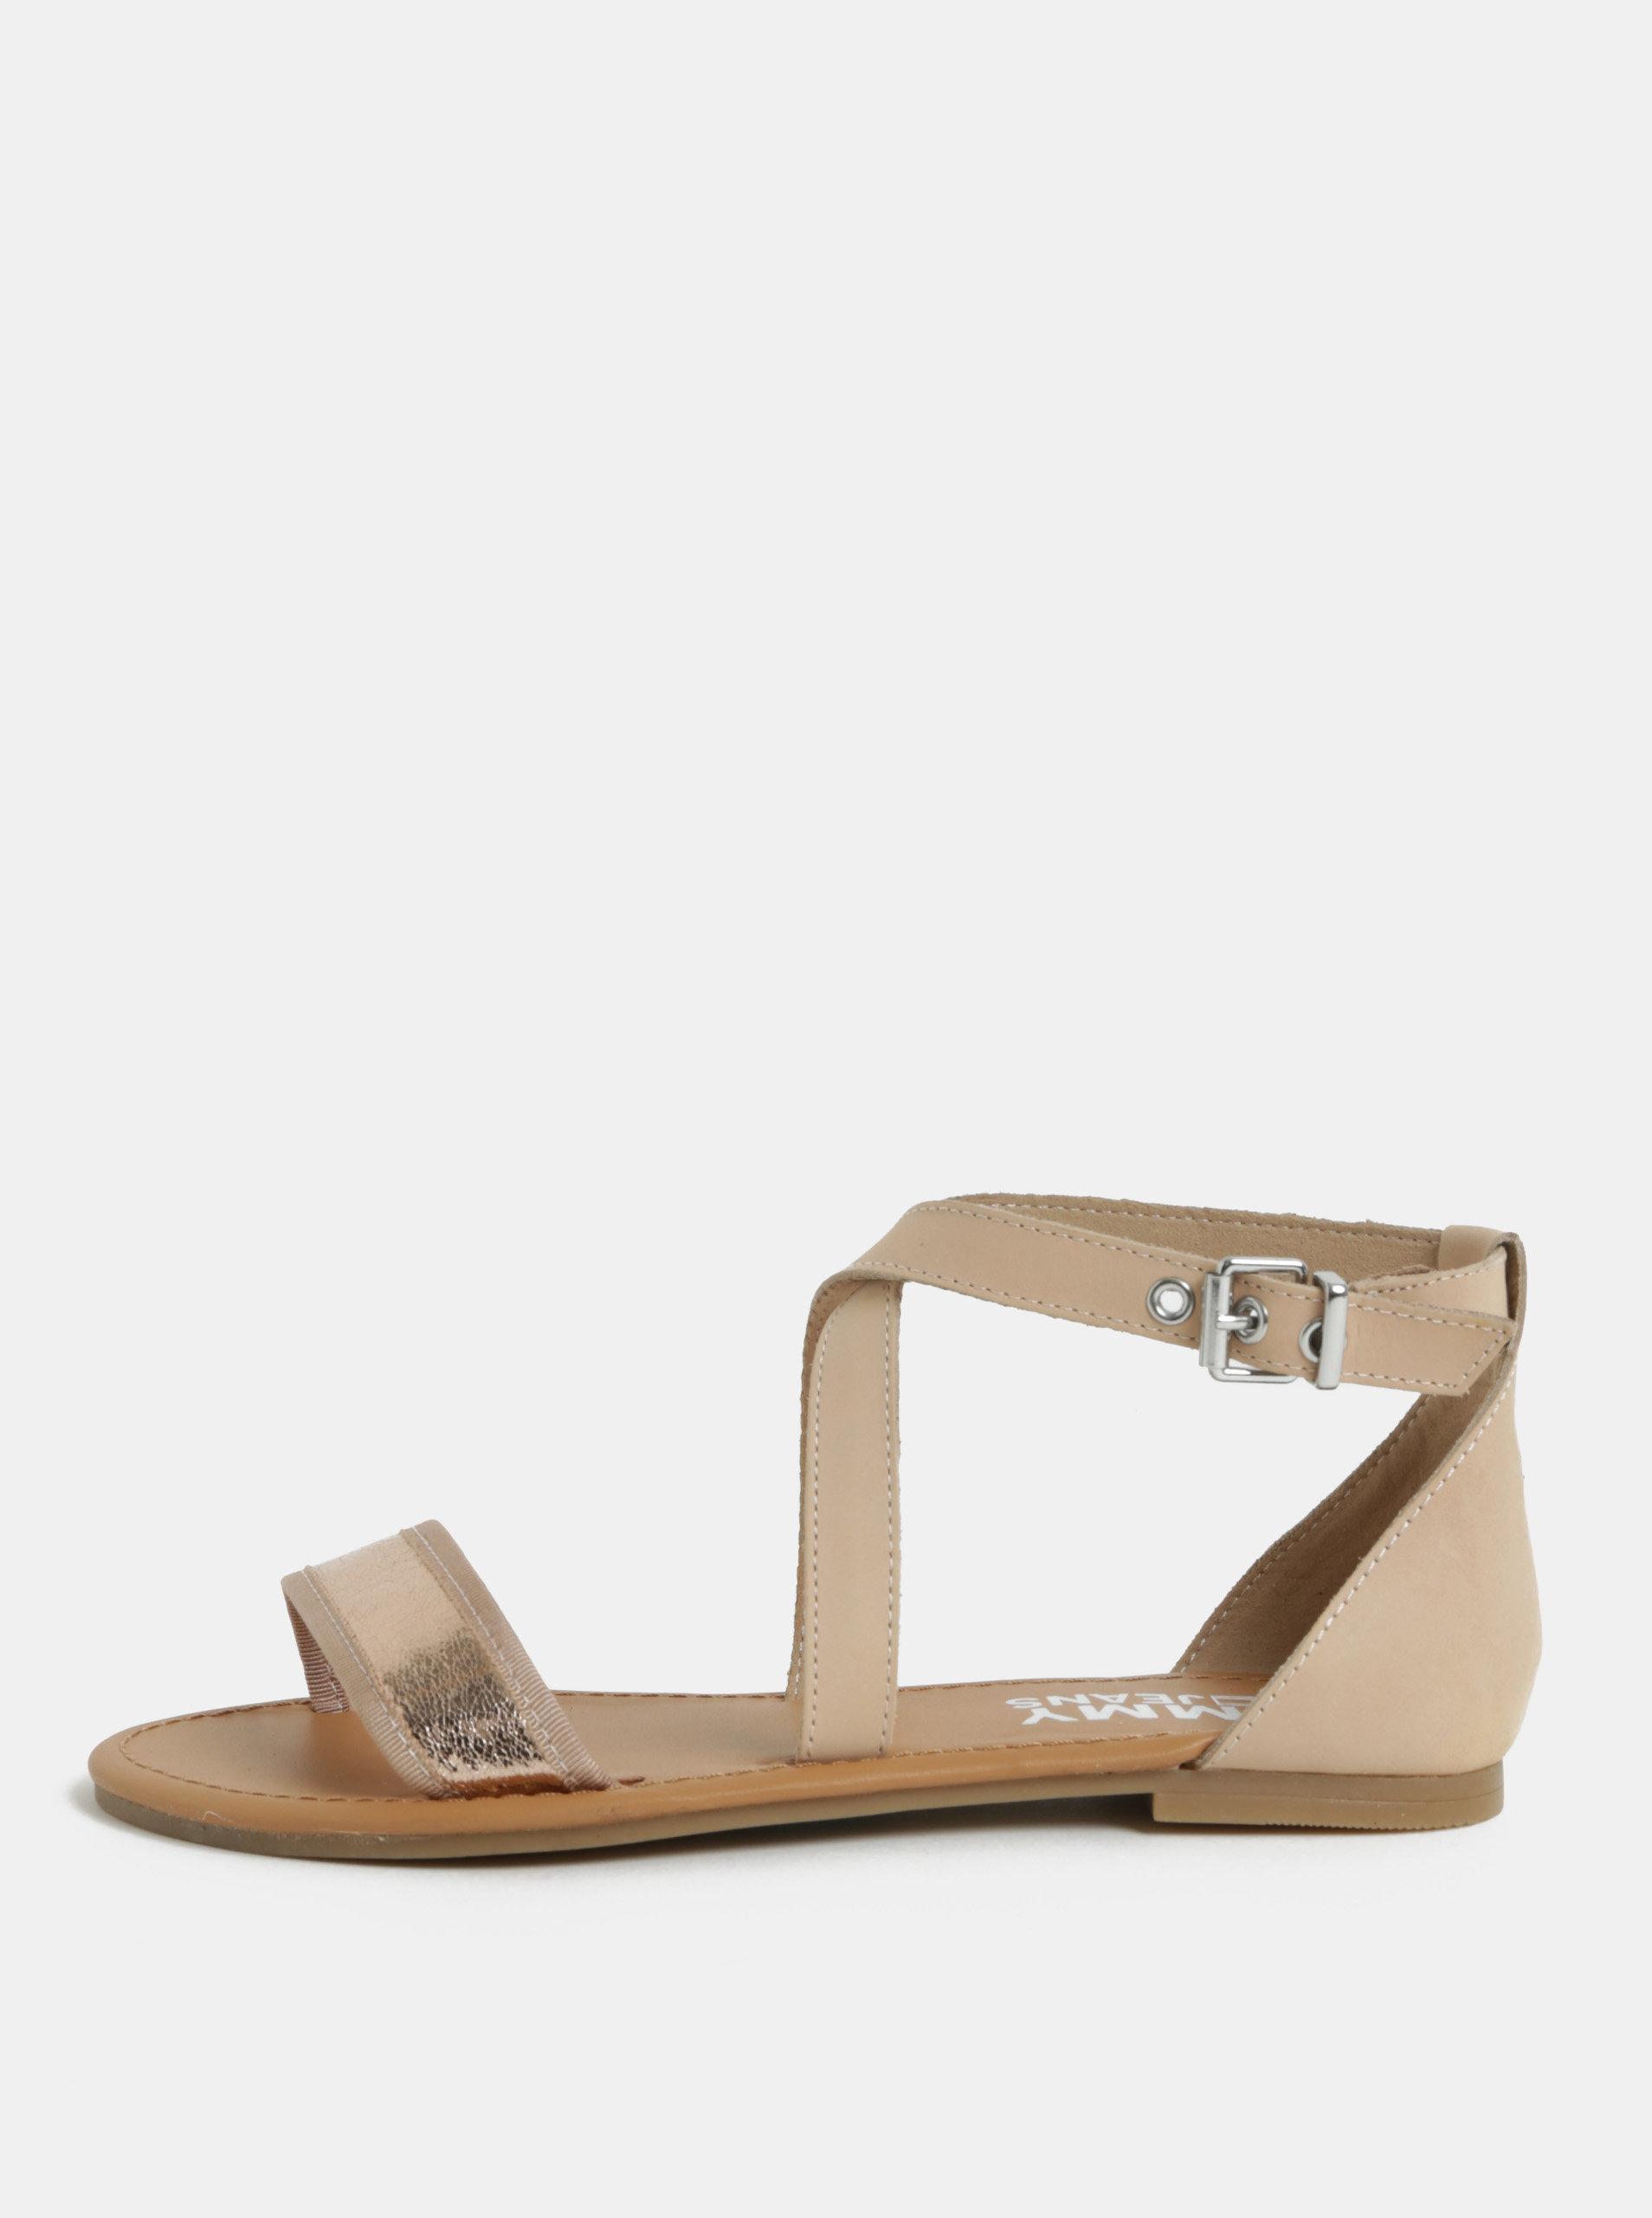 625e375387 Ružové dámske kožené sandále Tommy Hilfiger ...